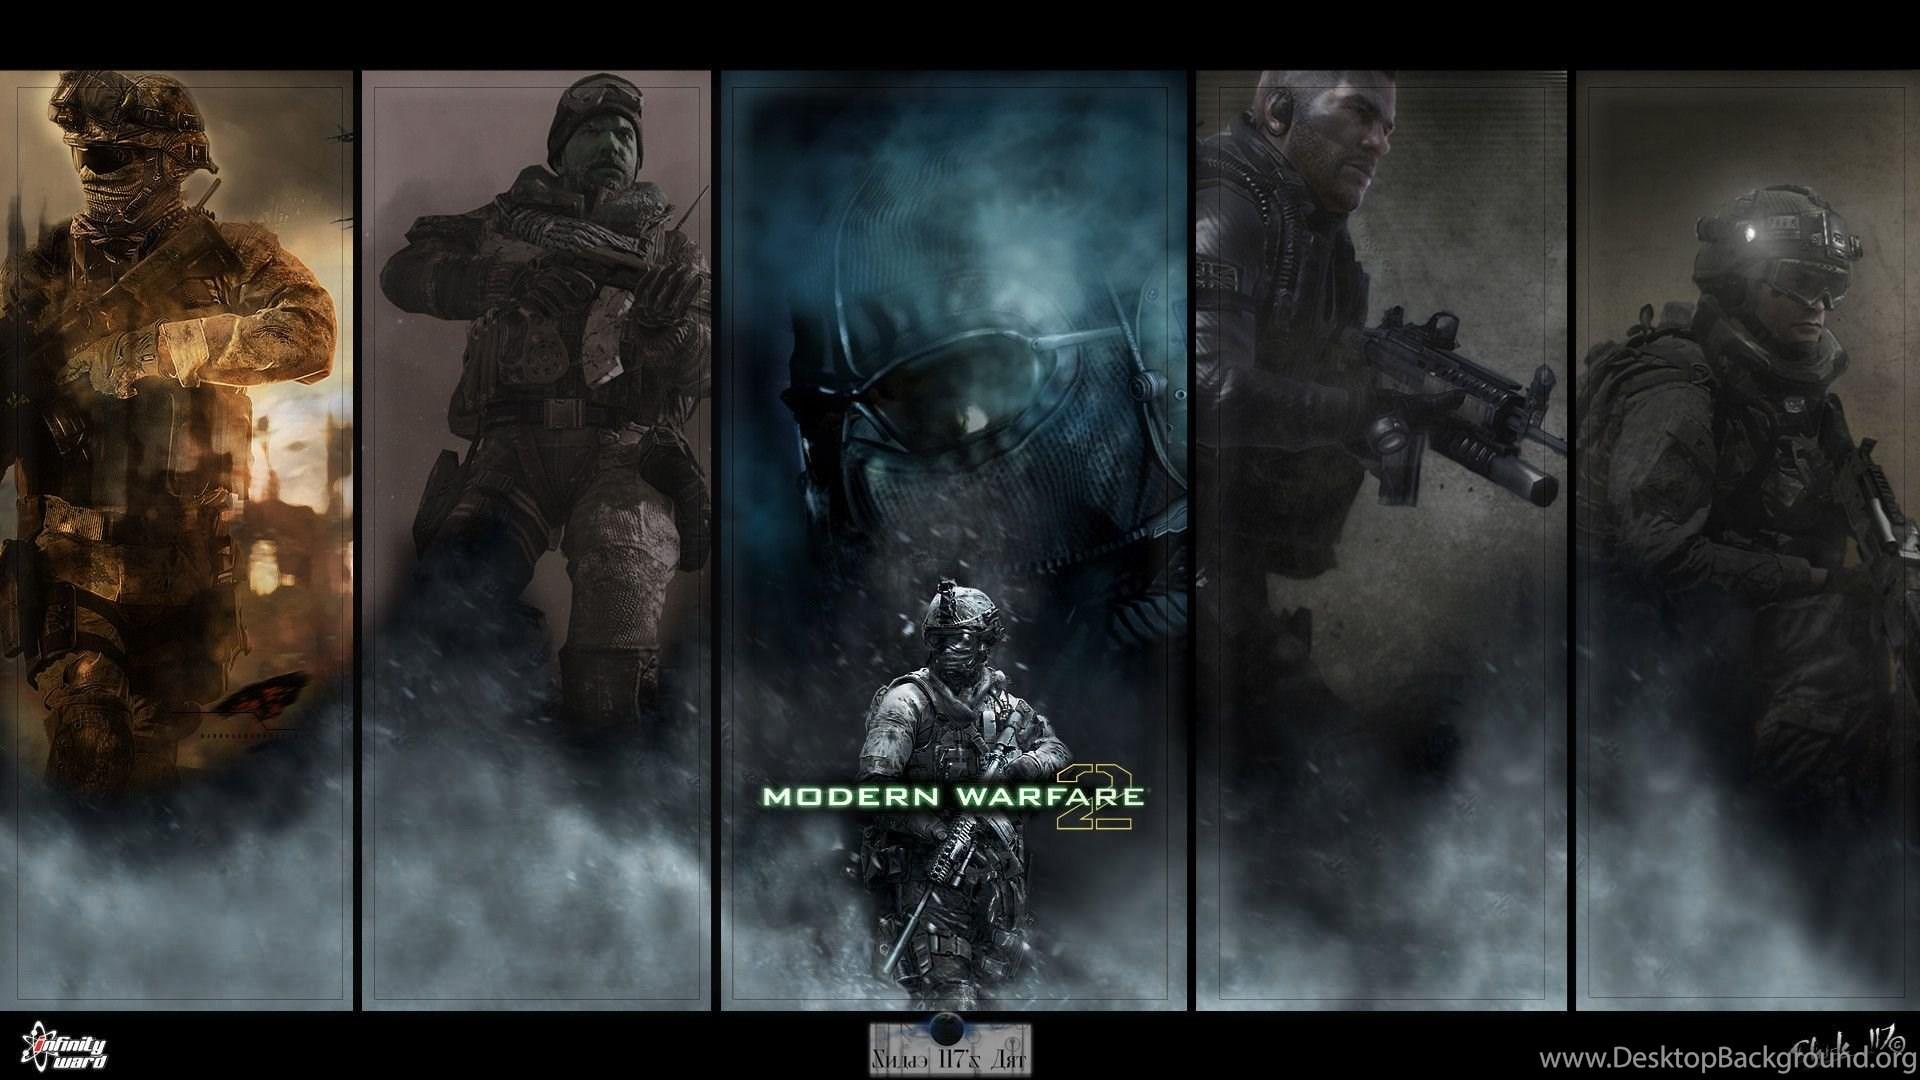 modern warfare 2 wallpapers hd wallpapers cave desktop background